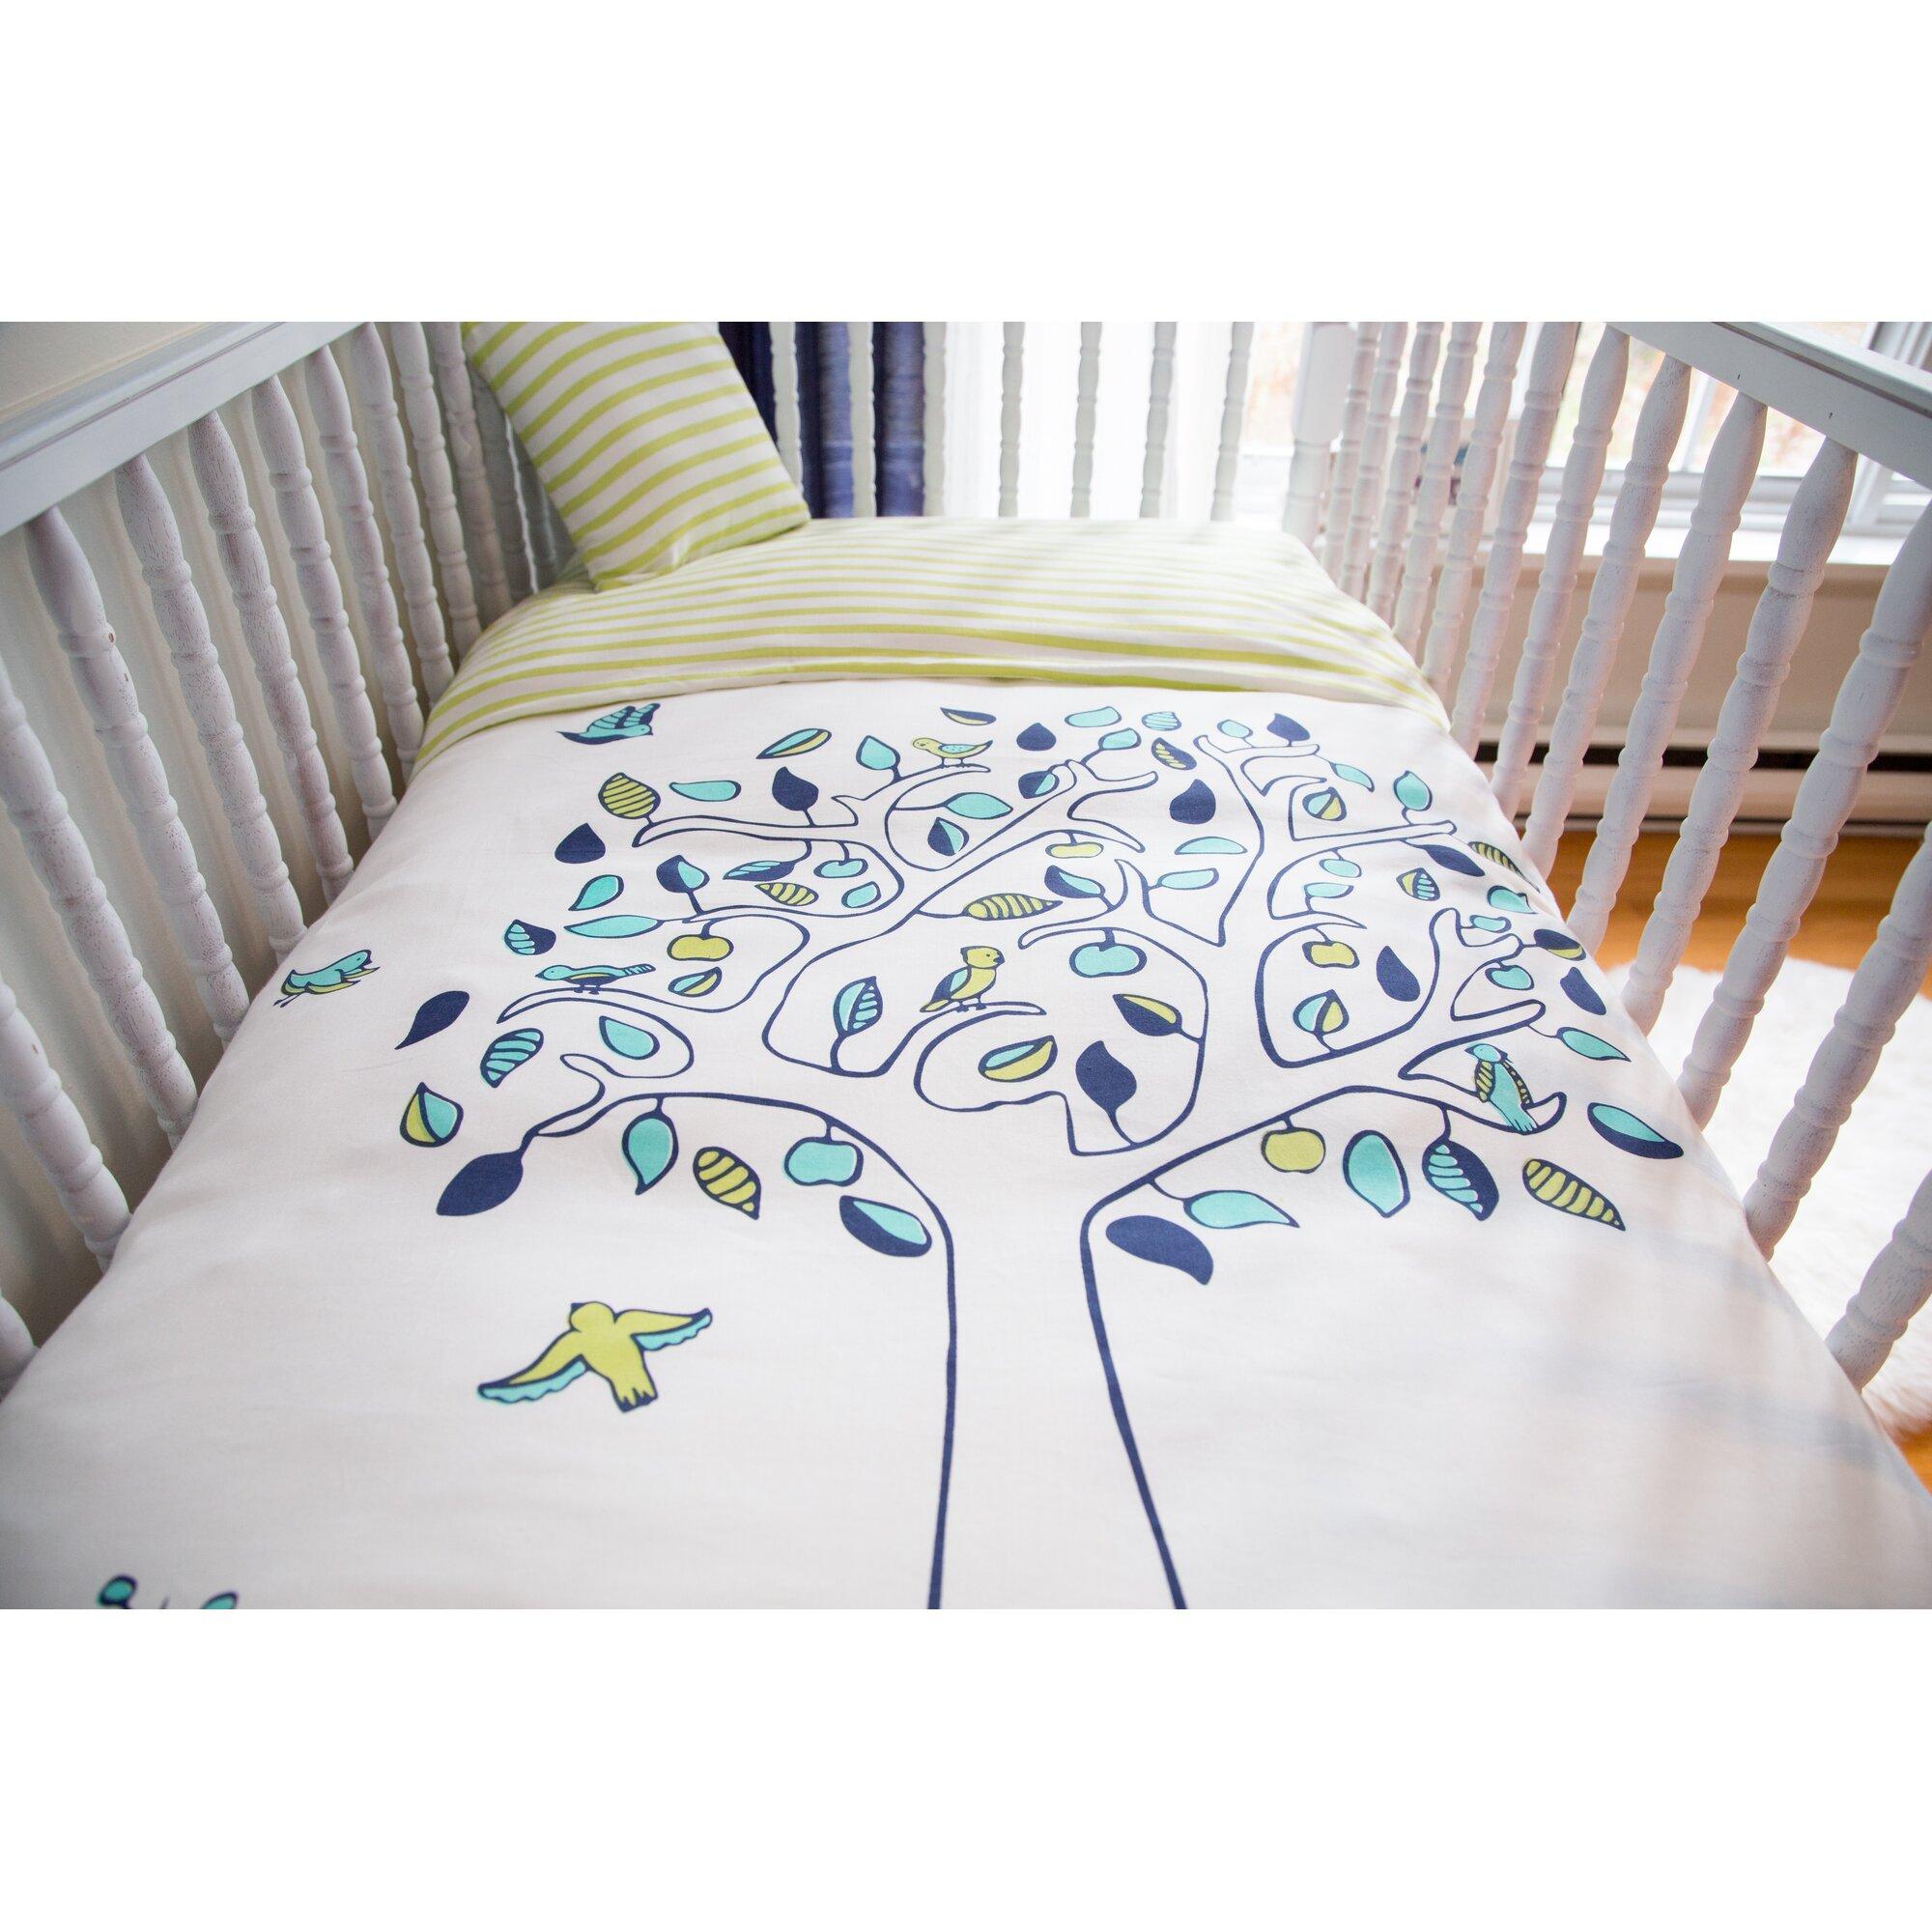 organic baby crib sheets - organic baby crib sheets  apple tree organic baby down duvet  piece cribbedding set